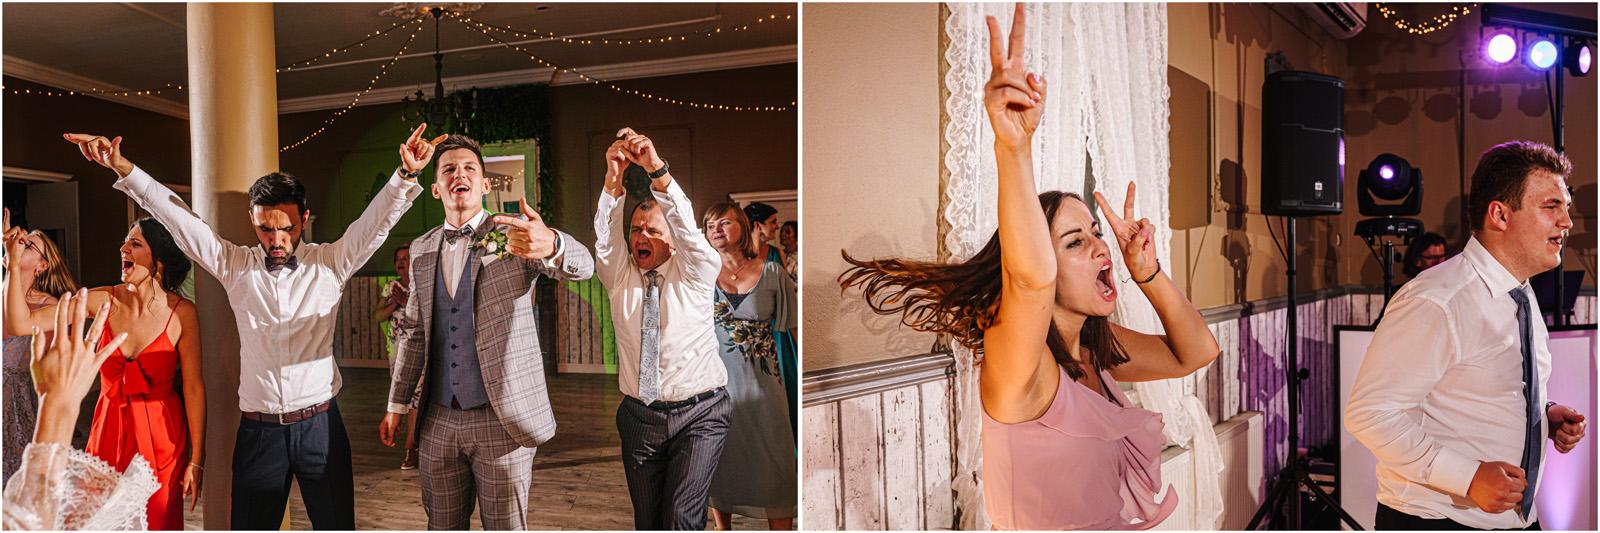 Ania & Mateusz | boho wesele w Stodole pod Kasztanami 125